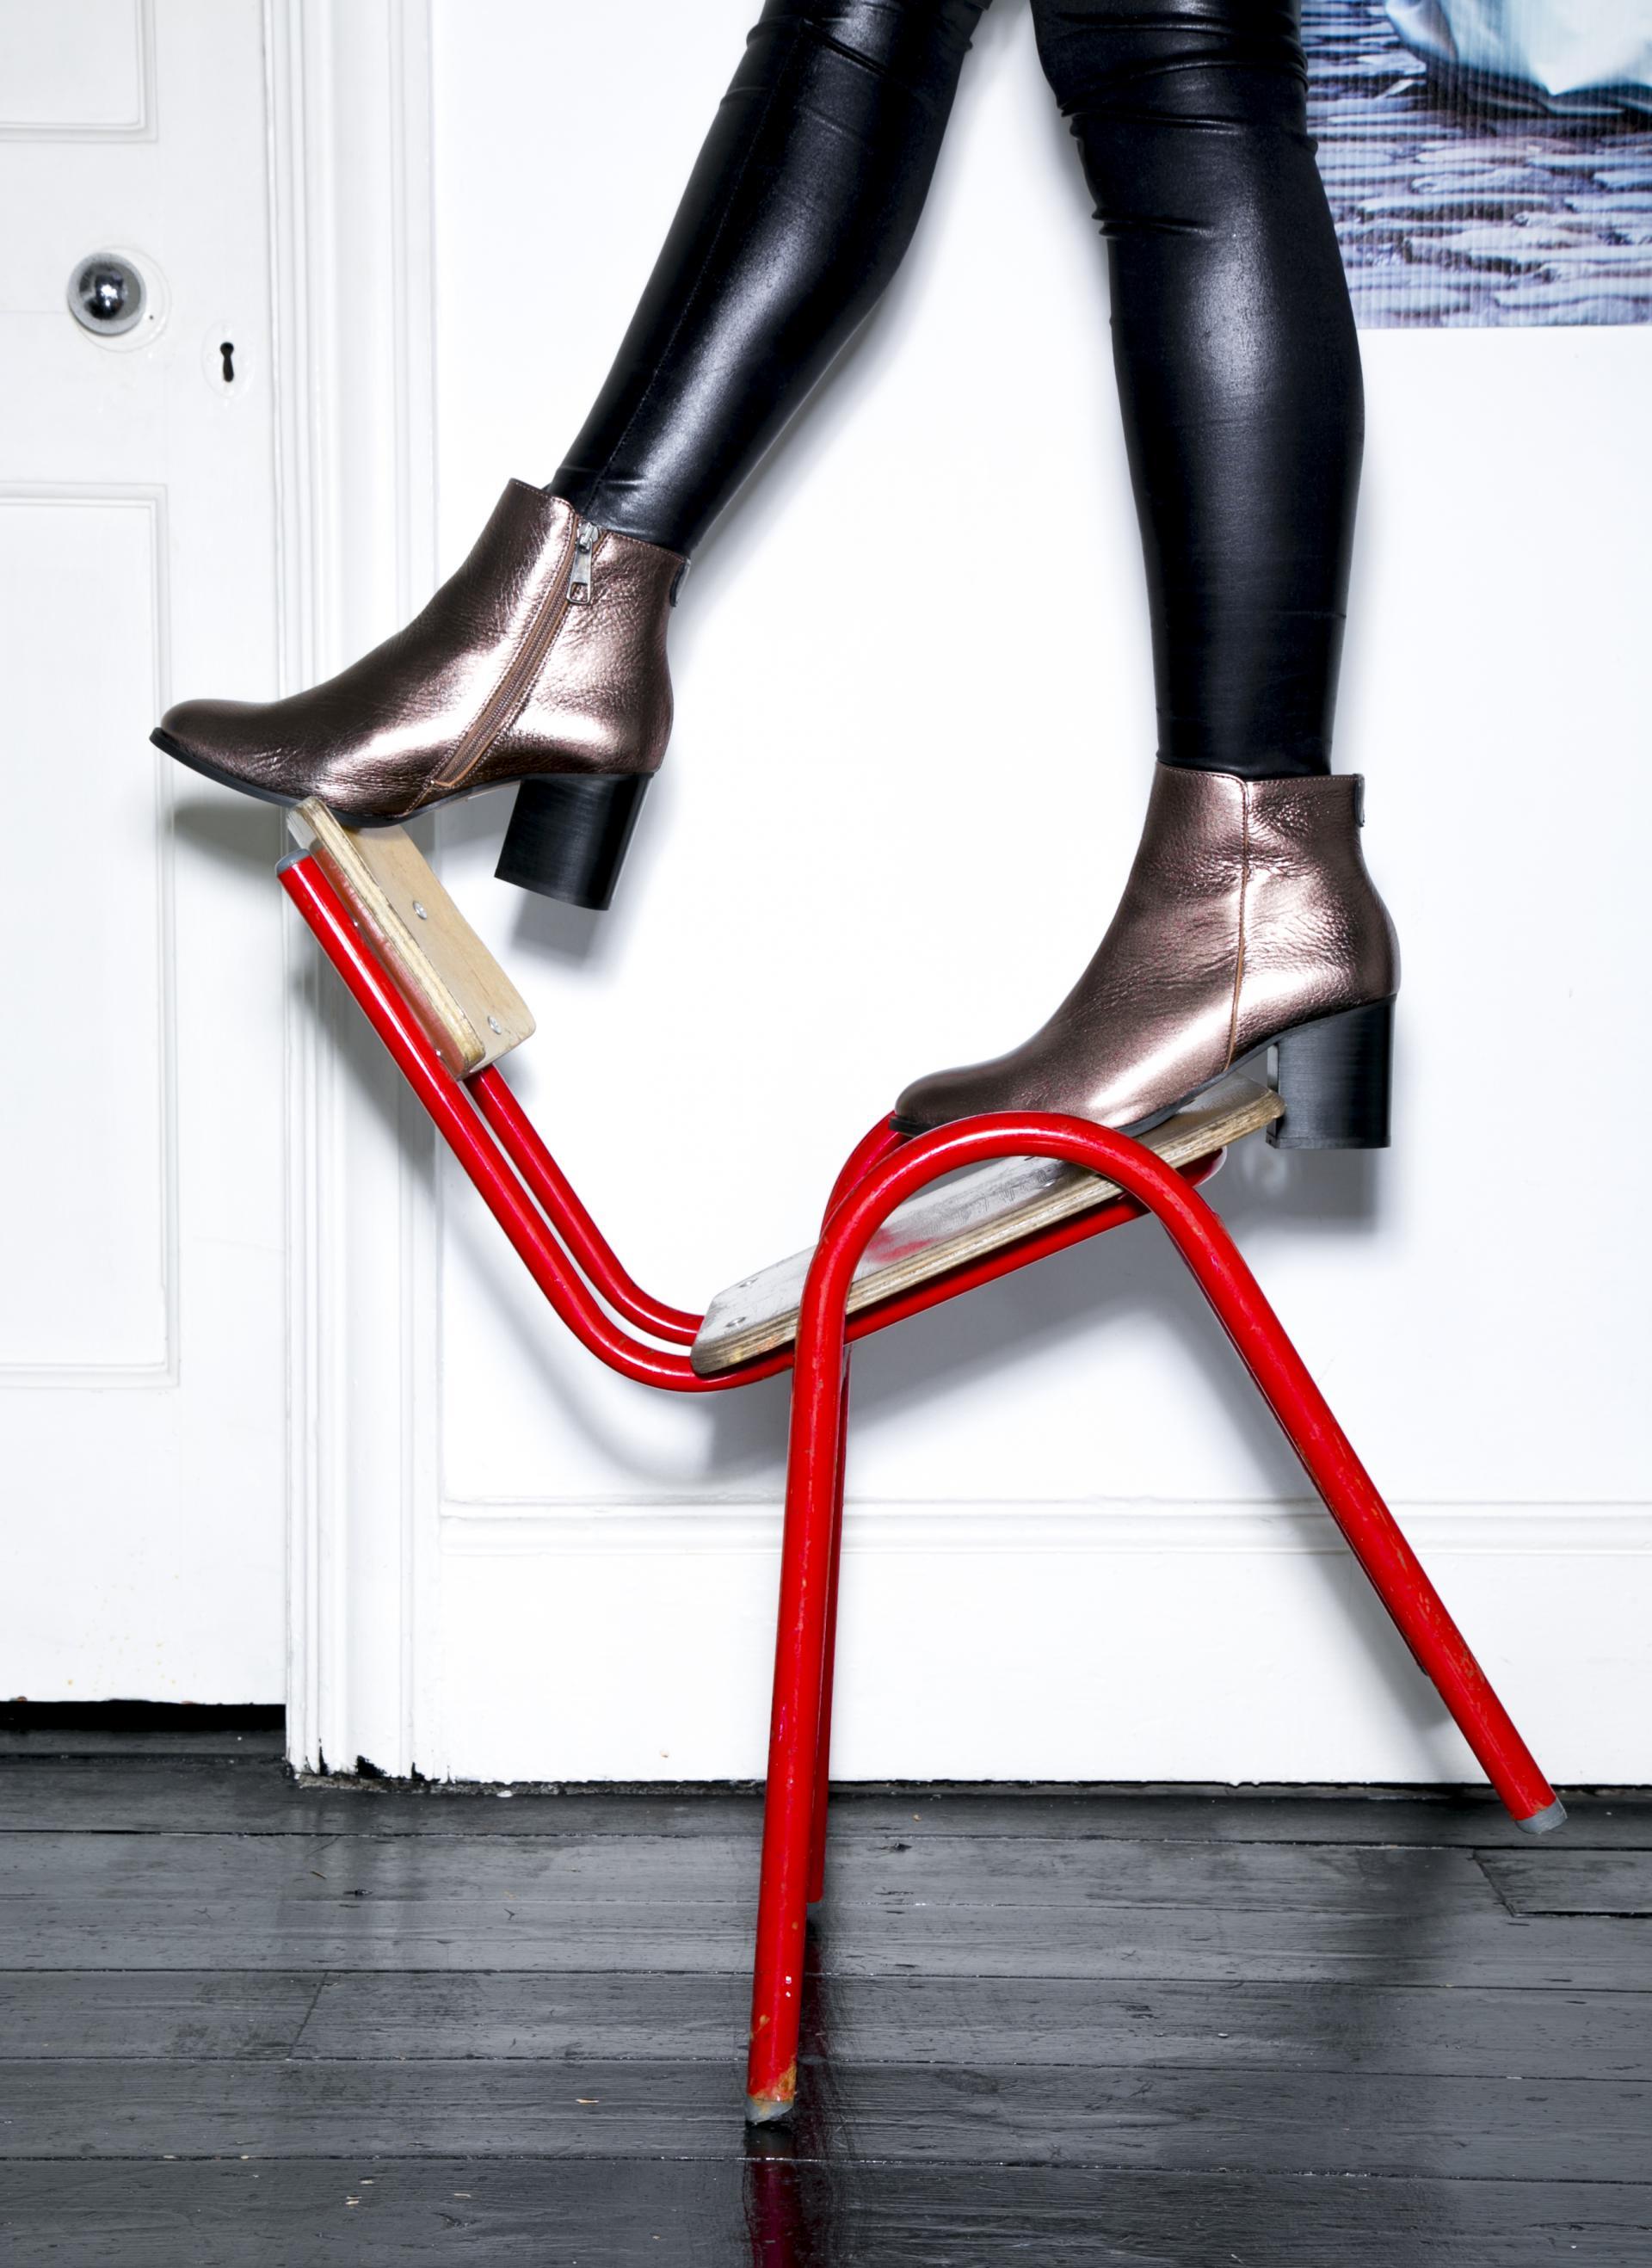 Courtney Smith x Buffalo Shoe Lab Collaboration Floralesque